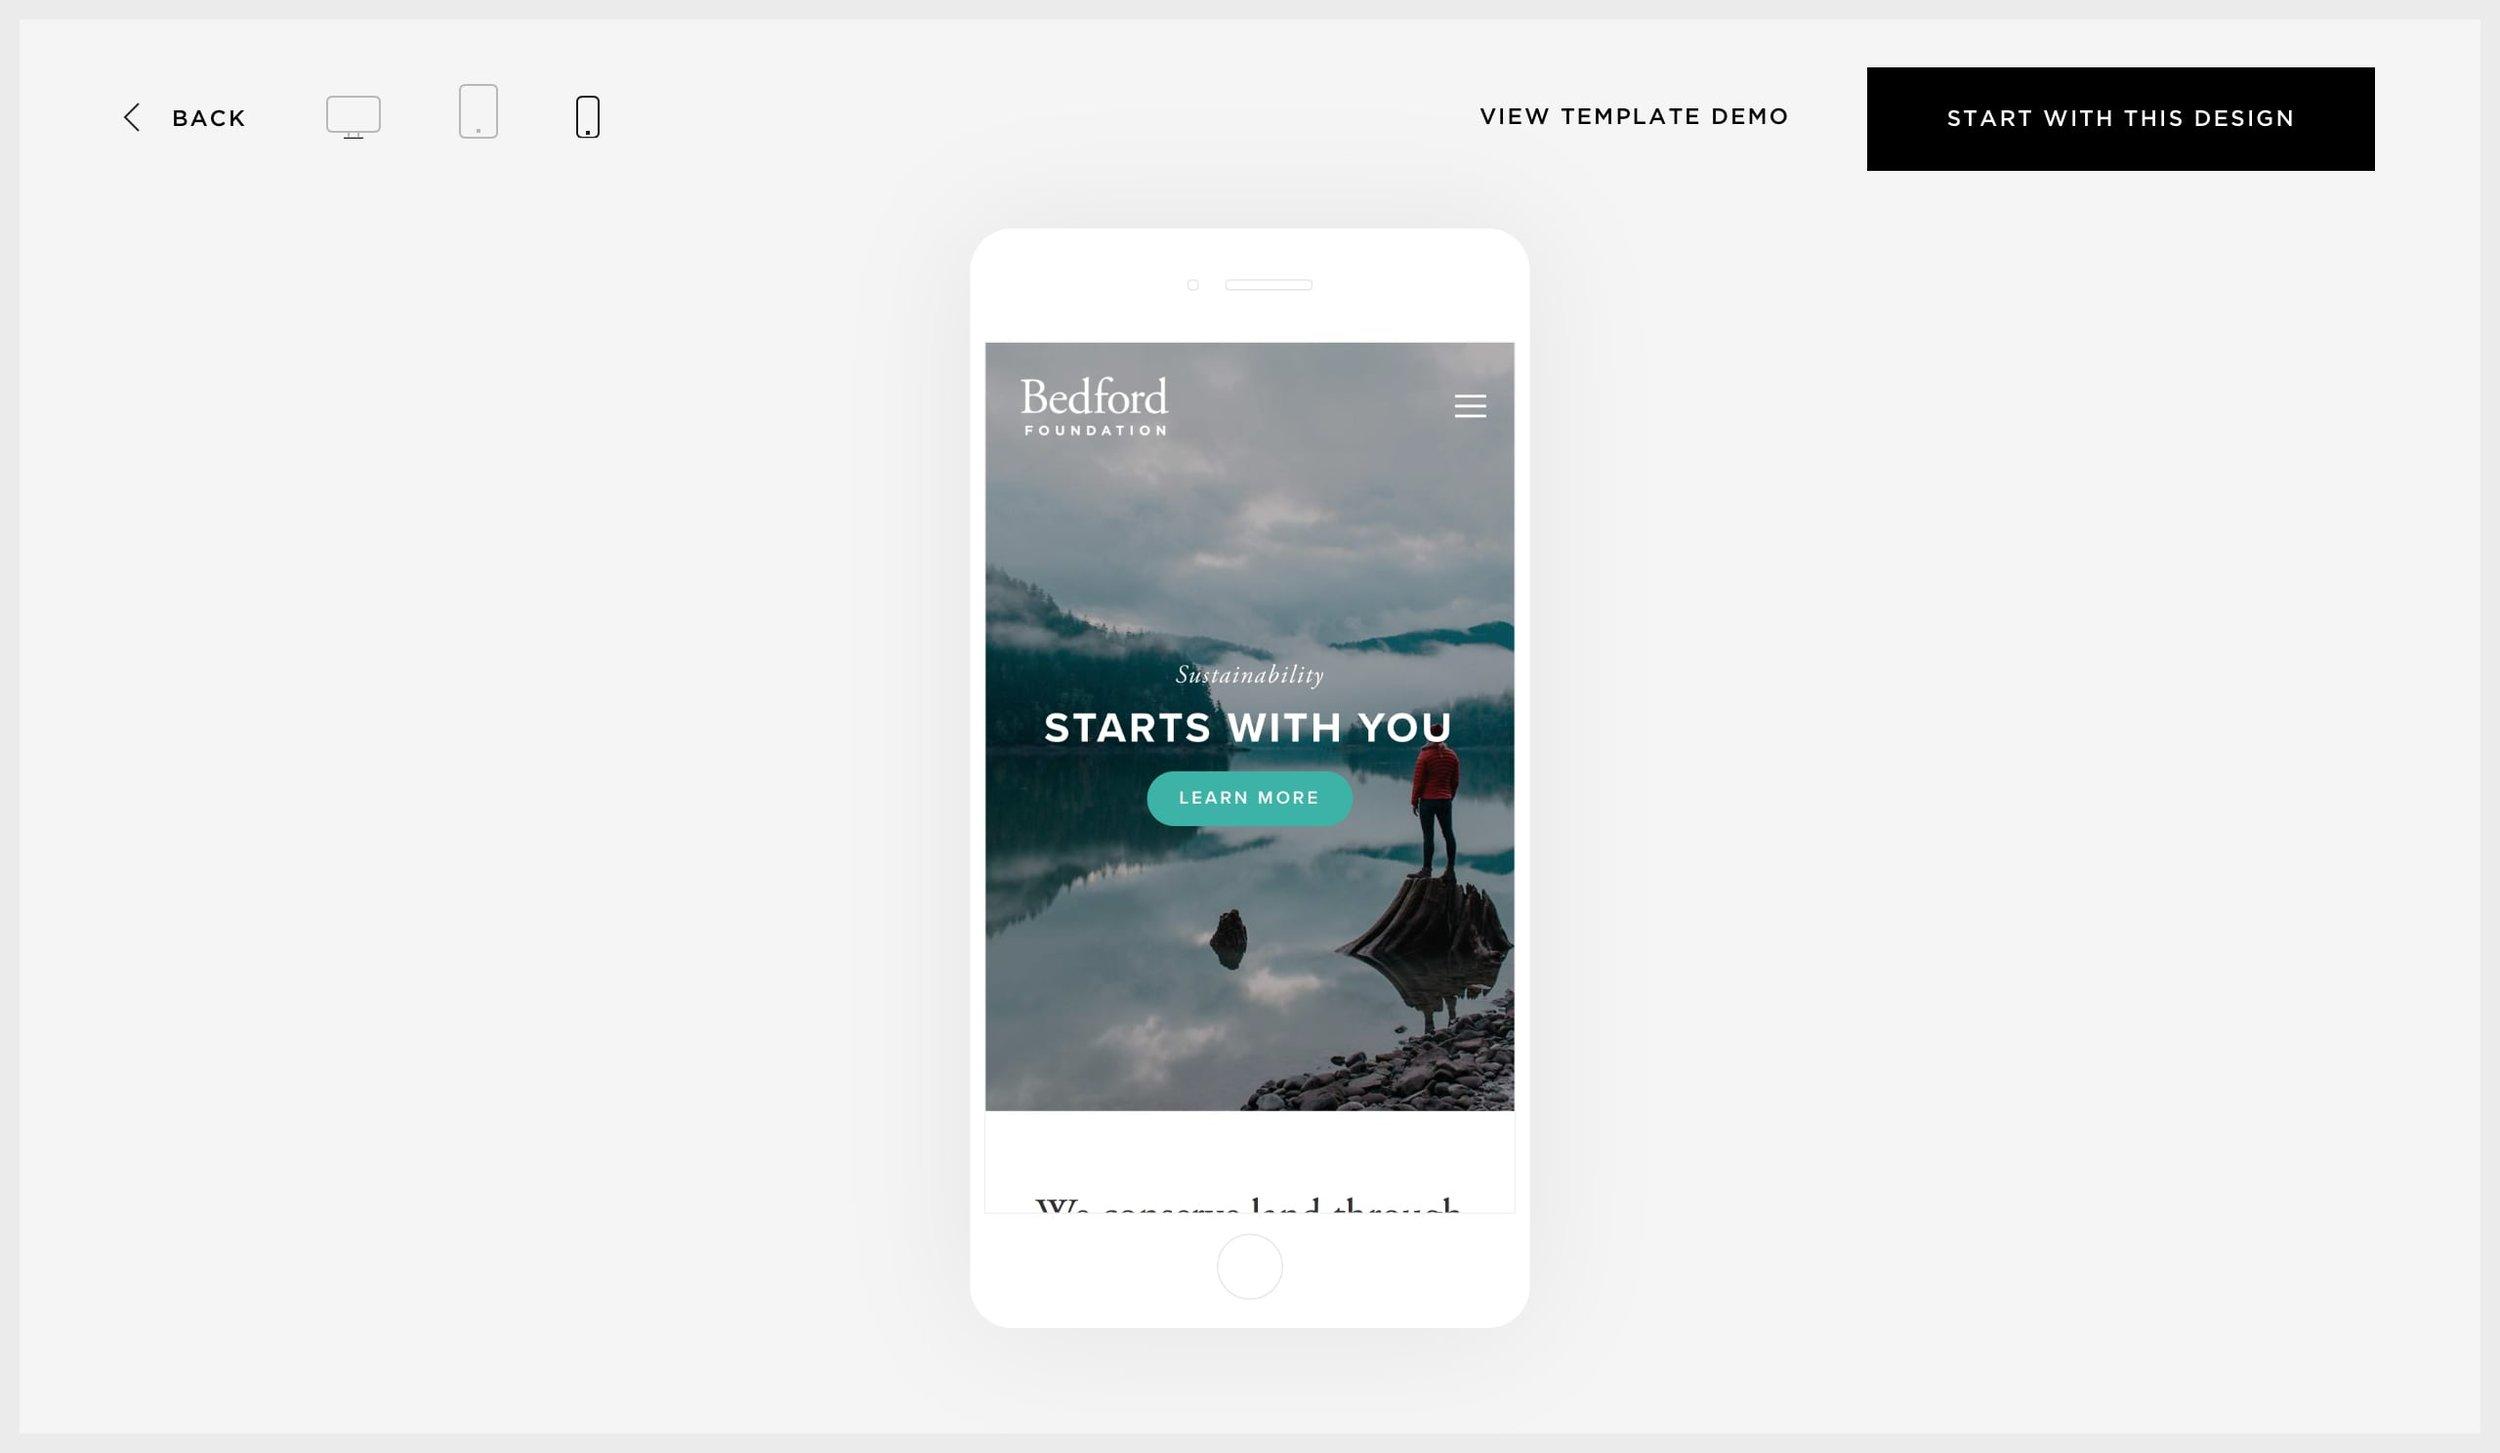 reponsive-template-design